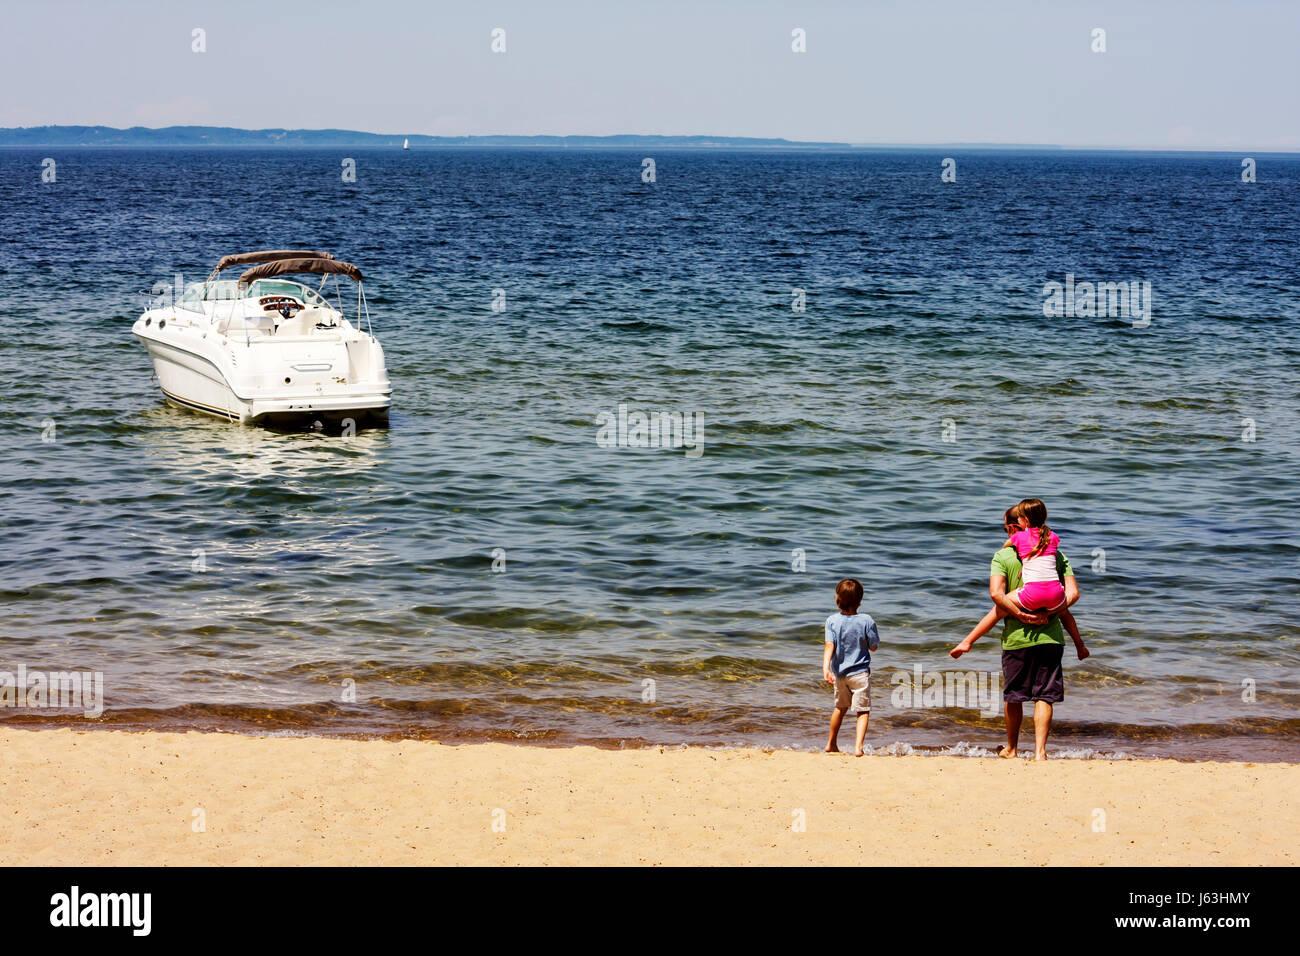 Michigan Traverse City West Arm Grand Traverse Bay Clinch Parque chico chica hombre padre hijo playa agua piggyback Imagen De Stock